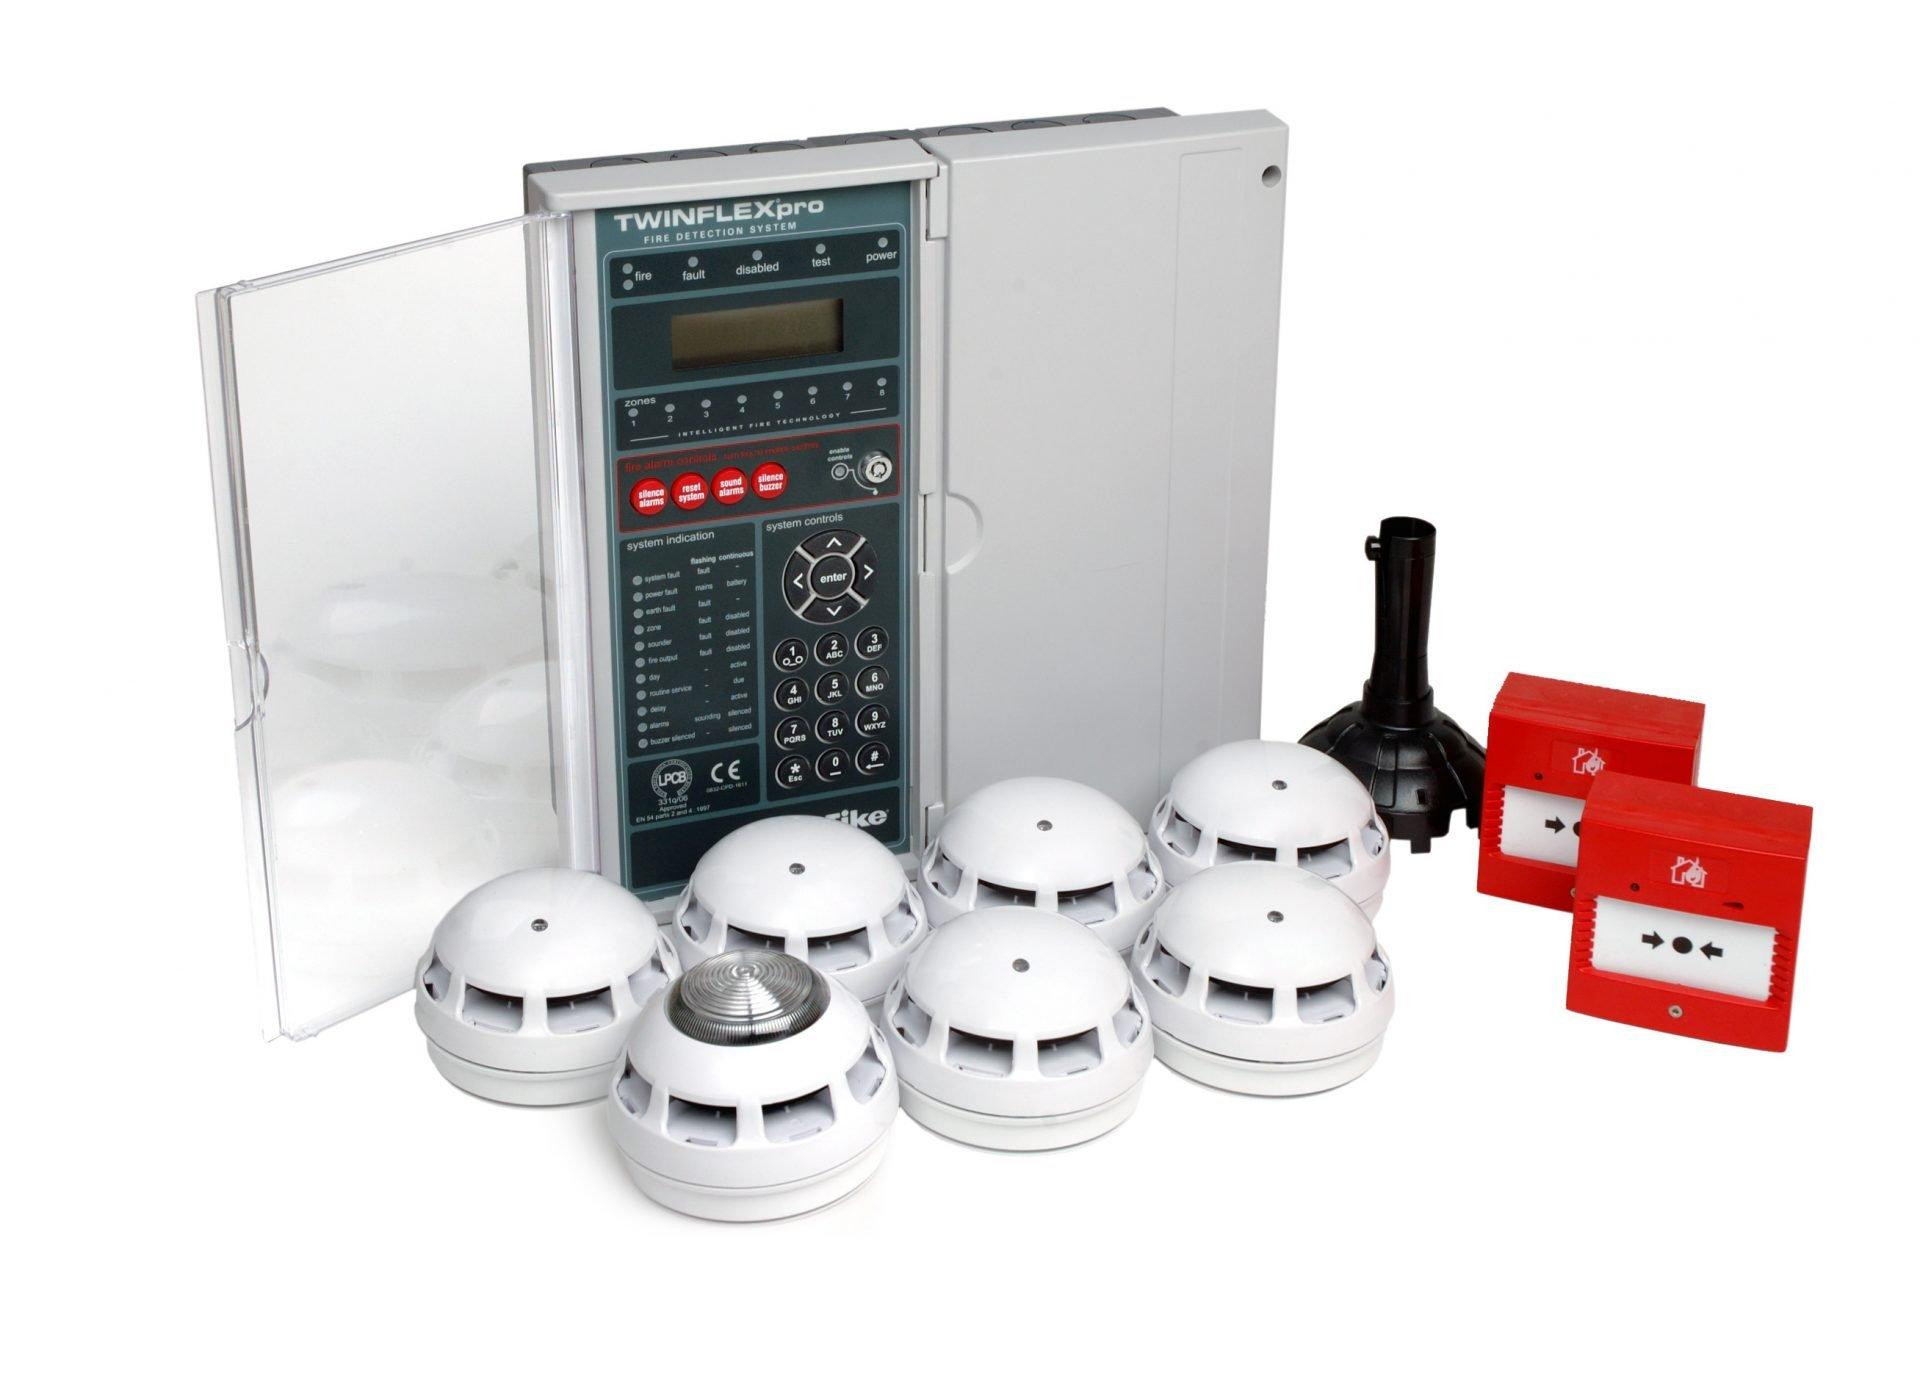 Fire alarm twin flex